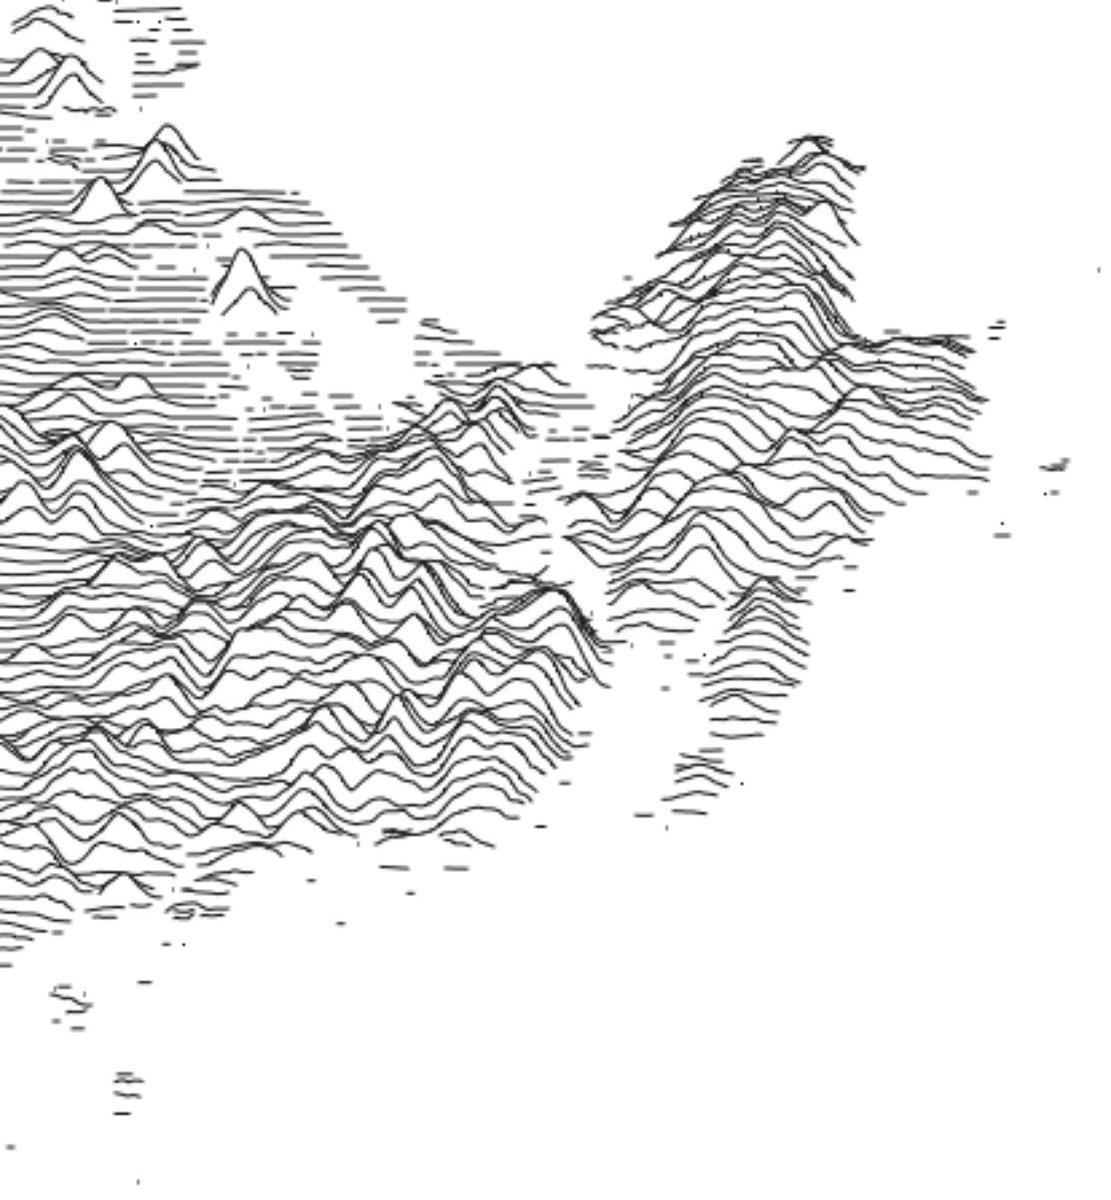 @anvaka @flowingdata @newsycombinator @kottke It works and it's amazing! Thanks so much 😊